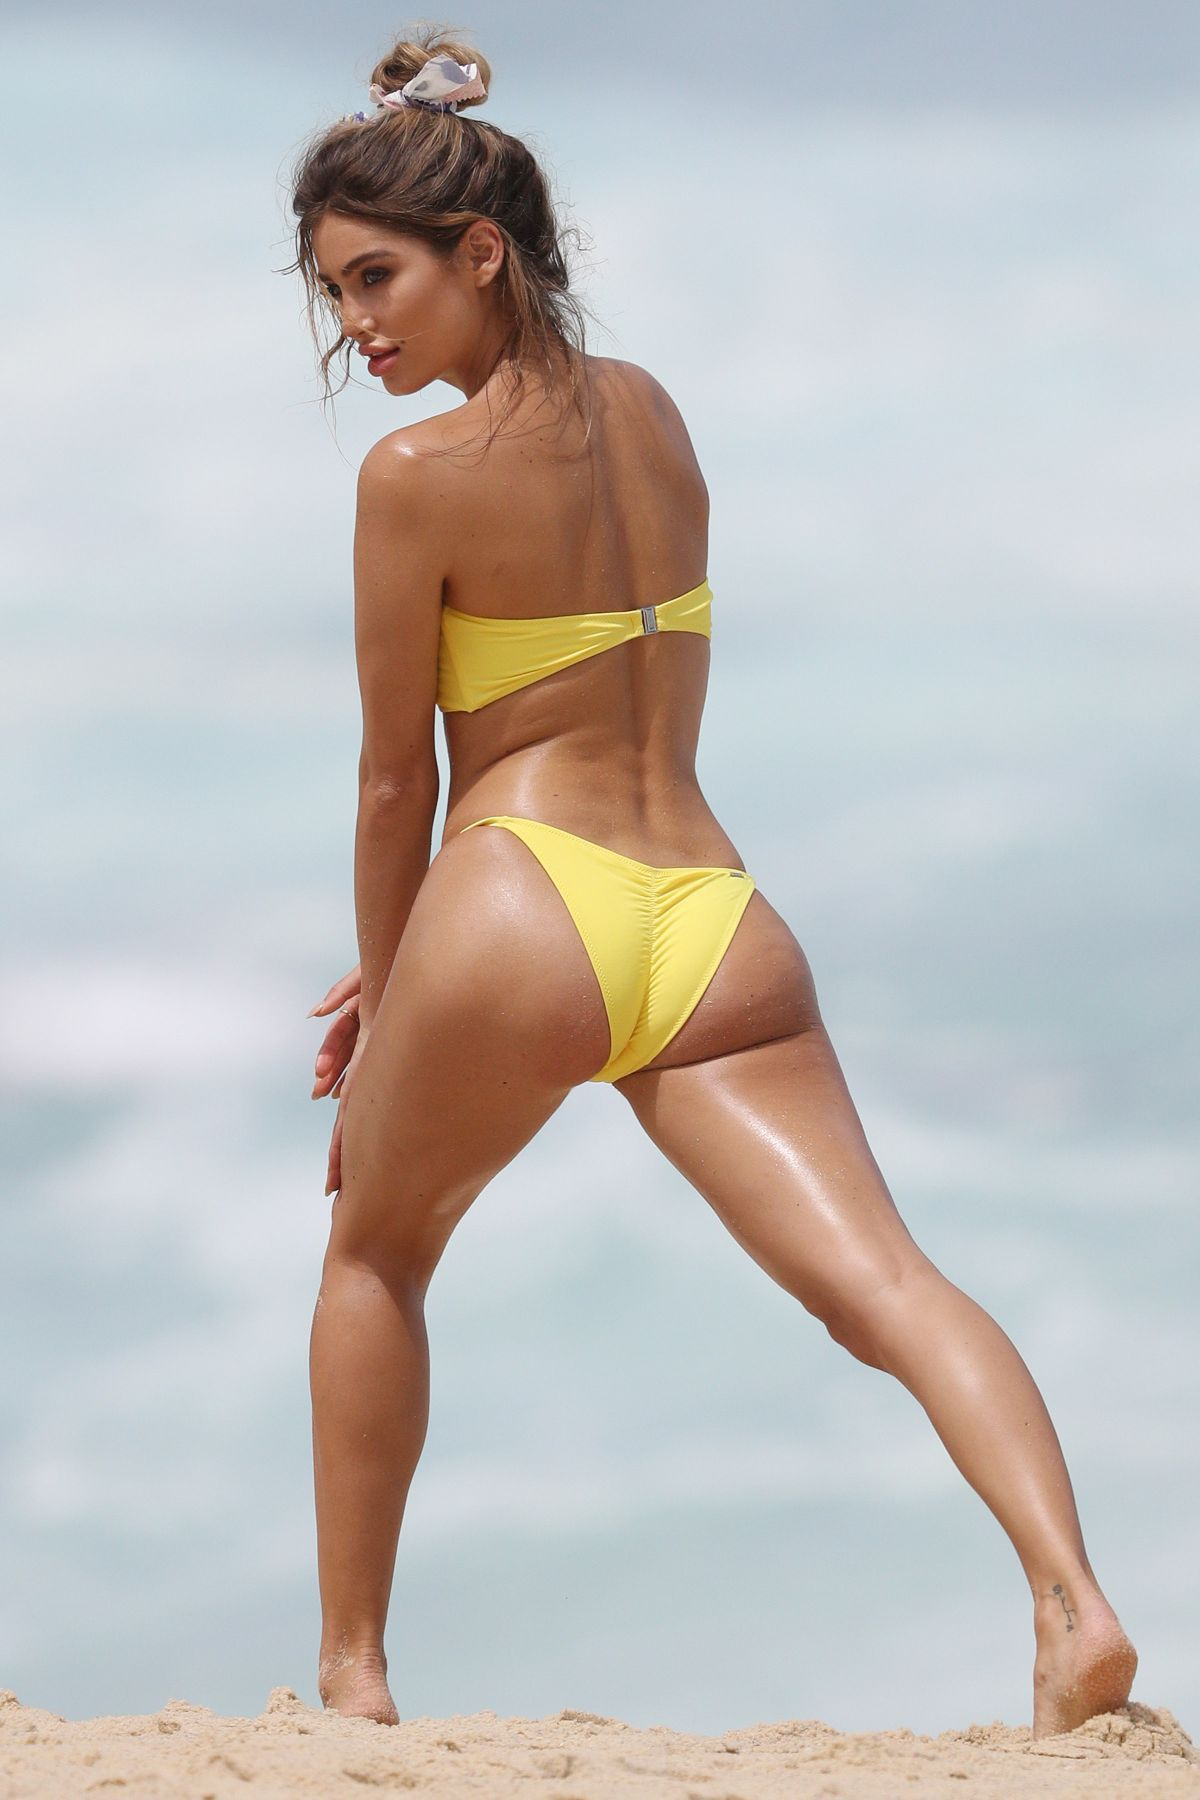 Bella Lucia Bikini Photoshoot on Bronte Beach Pic 29 of 35